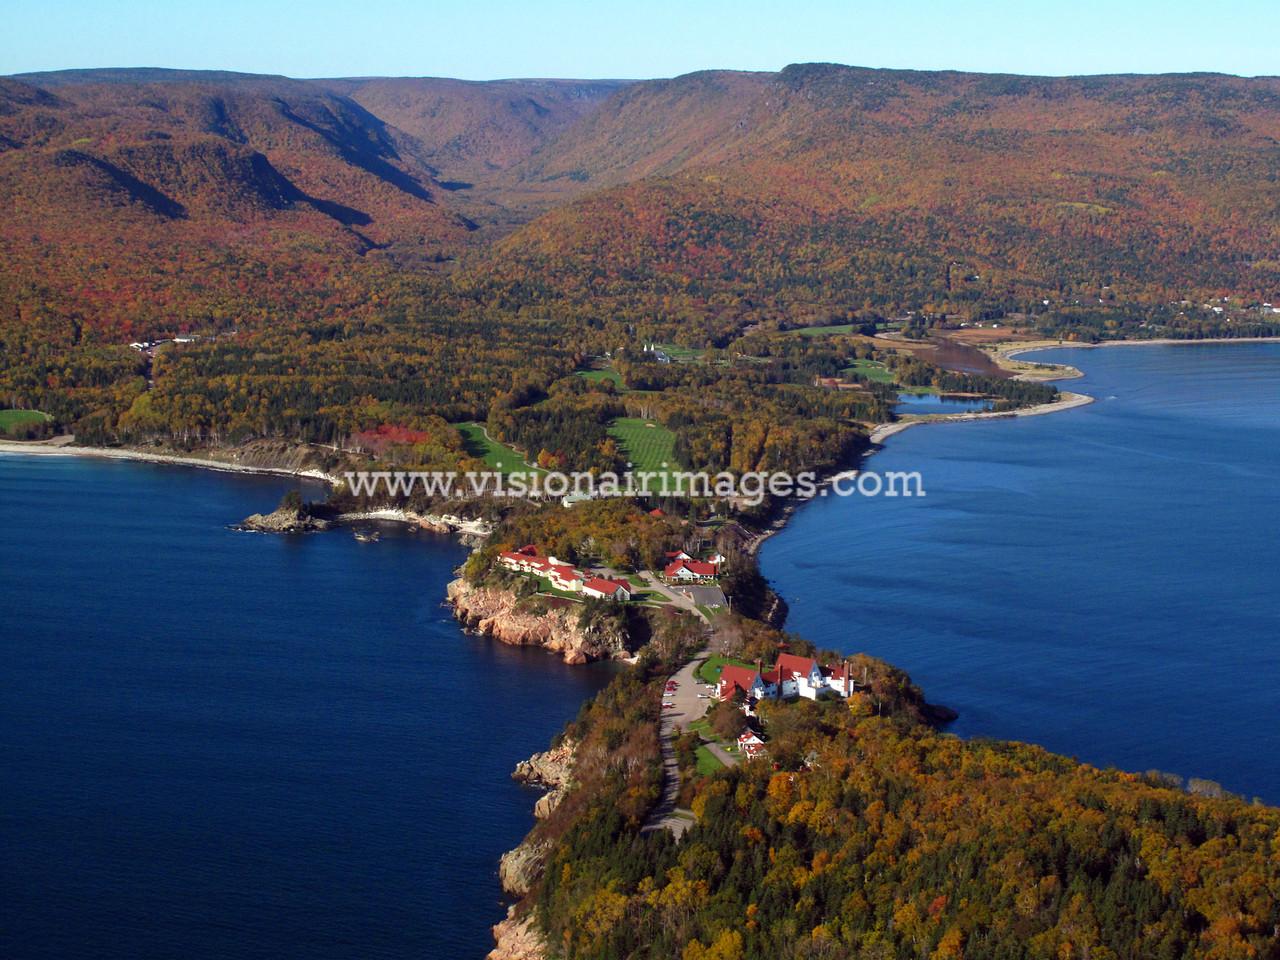 Celtic Lodge, Ingonish, Golf Course, Parks Canada, Cabot Trail, Cape Breton Highlands National Park, Nova Scotia, Canada